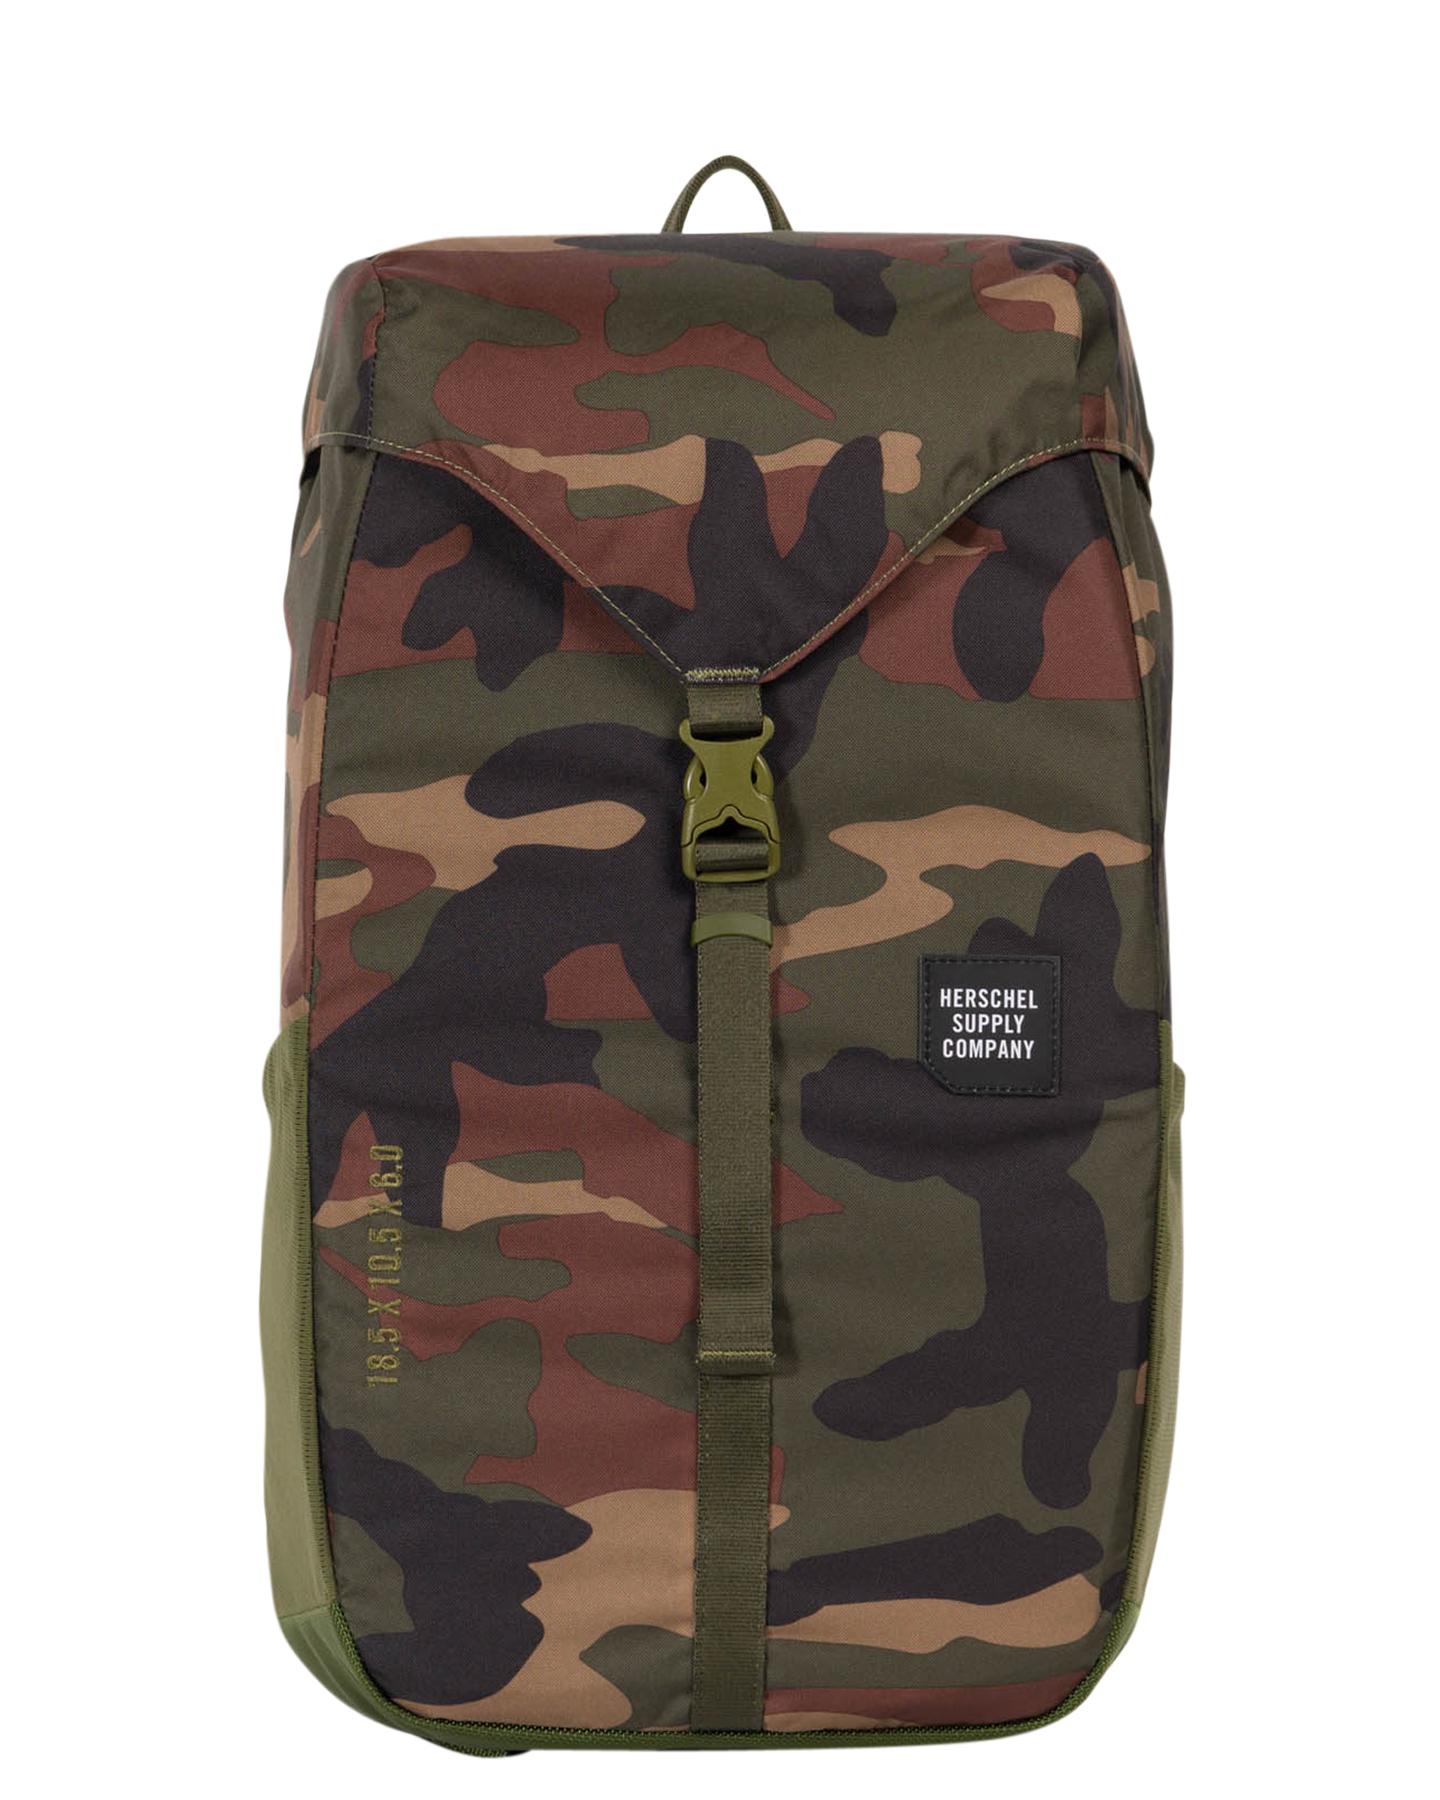 227cfc41e54 Herschel Supply Co Barlow Medium Trail 17L Backpack Woodland Camo Woodland  Camo